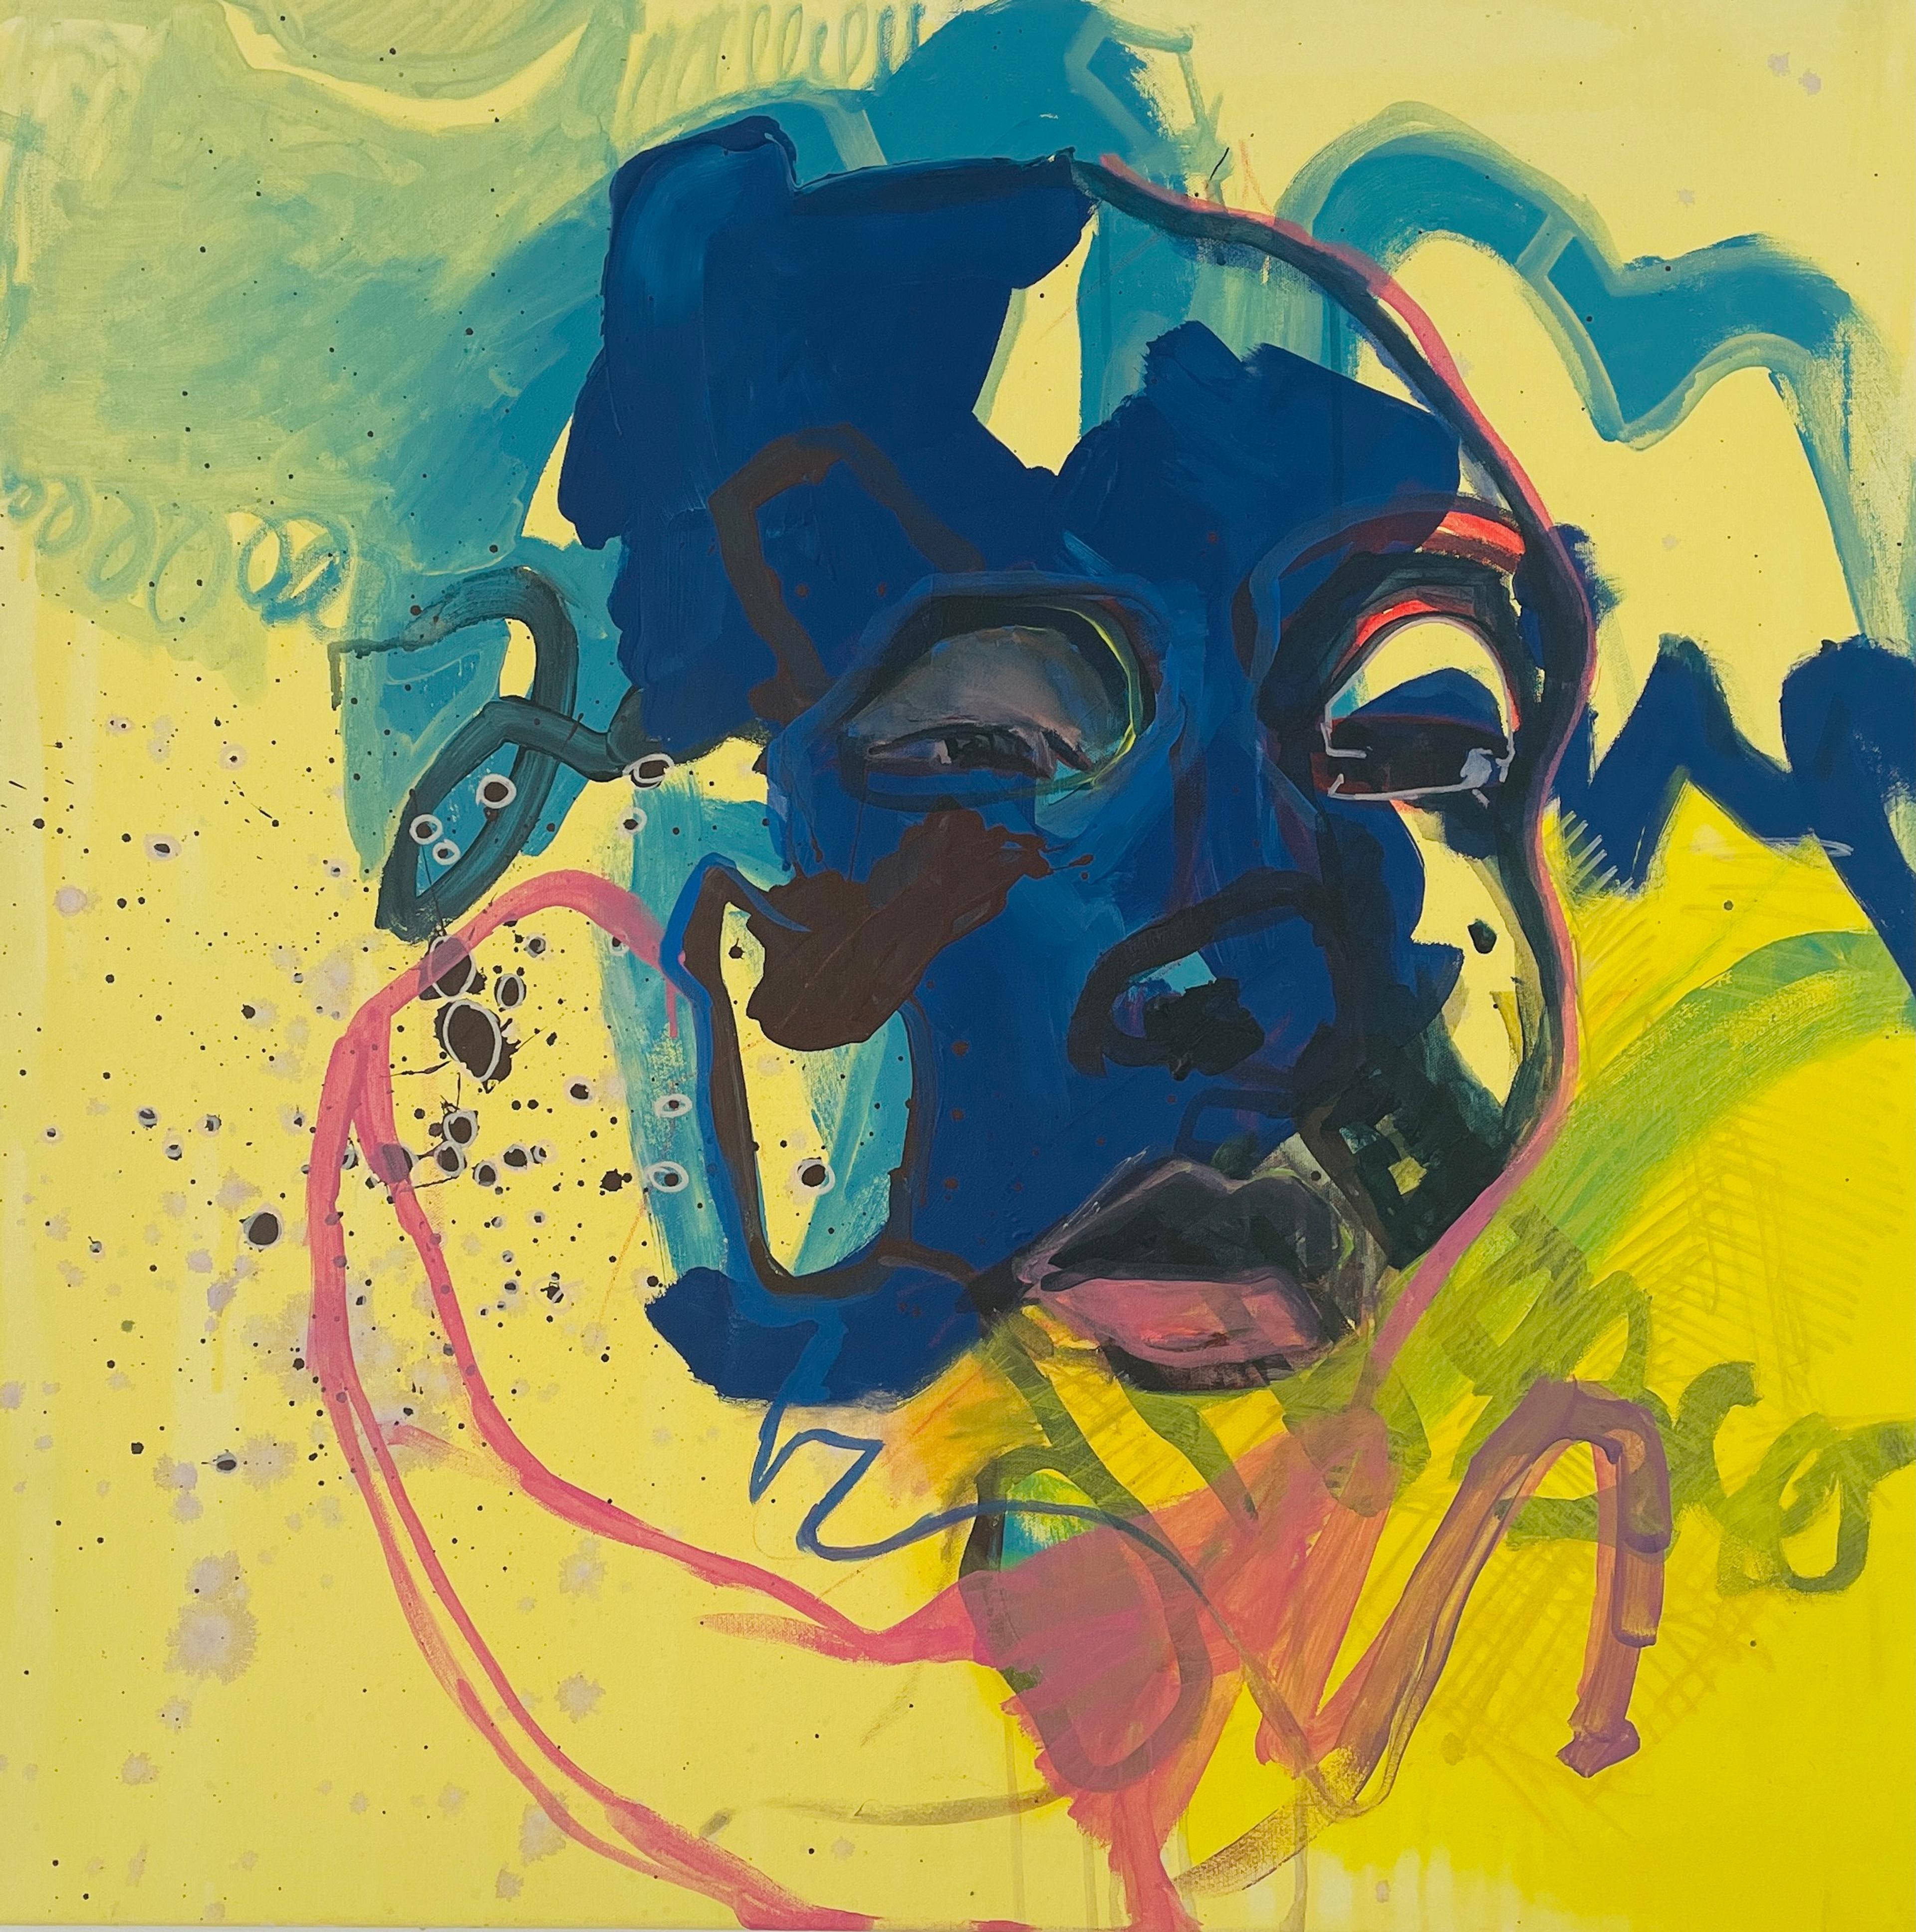 artwork Hear me out by Joséphine Sagna